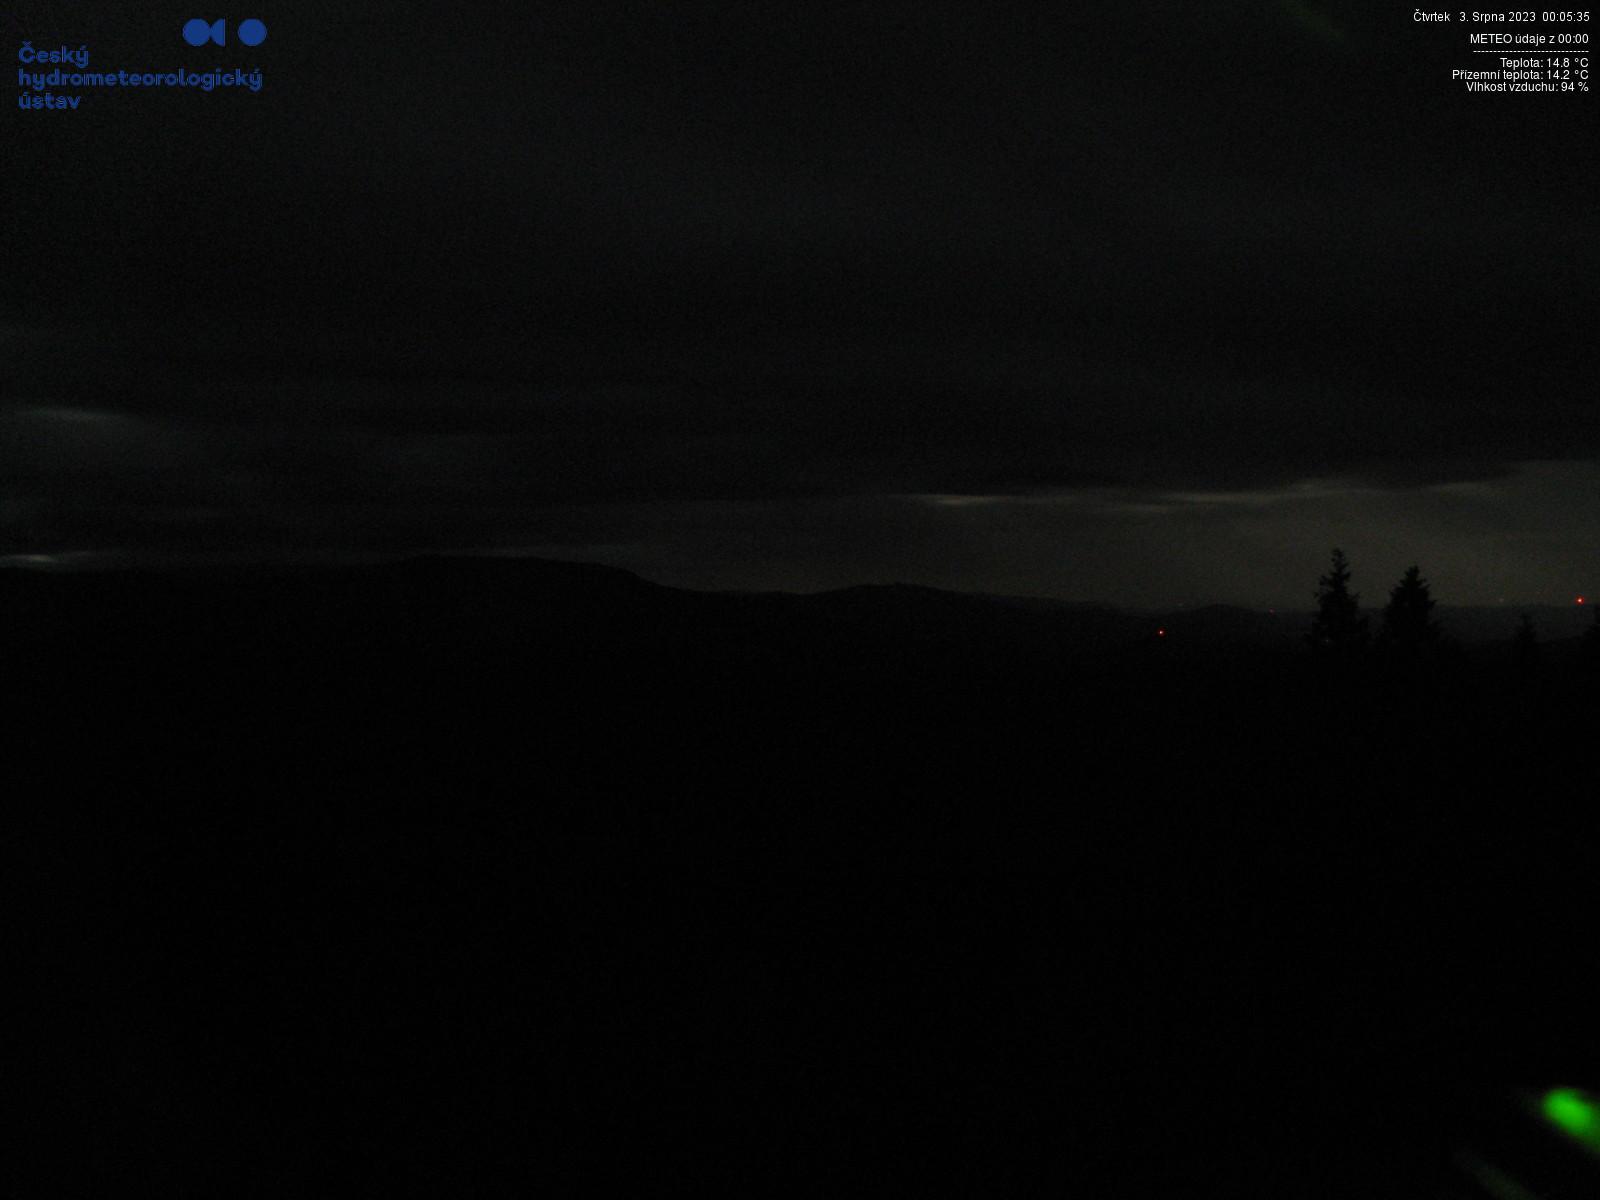 Pohled z meteo kamery